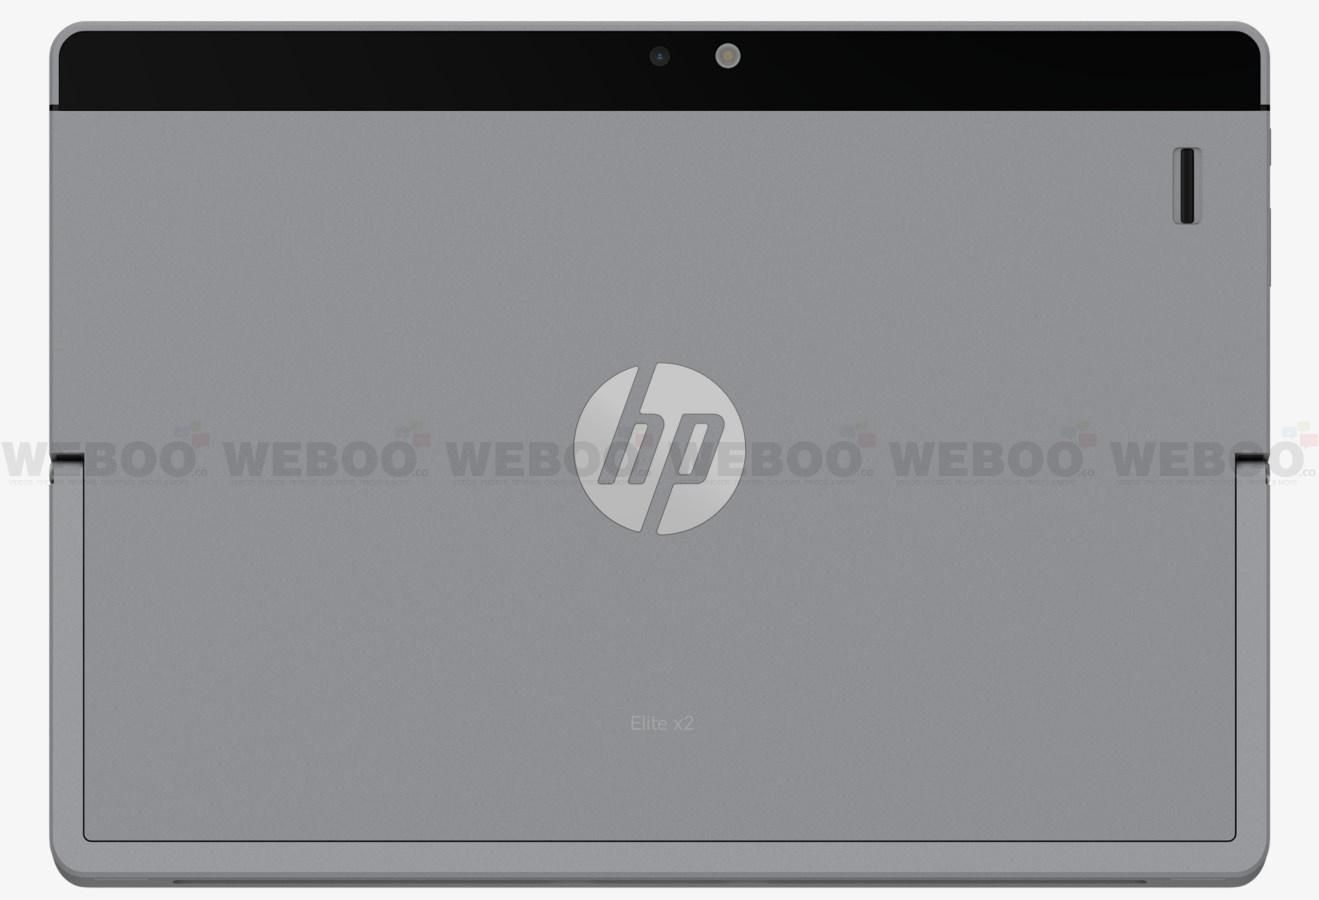 Verizon Starts Selling the HP Elite x2 Windows 10 Pro